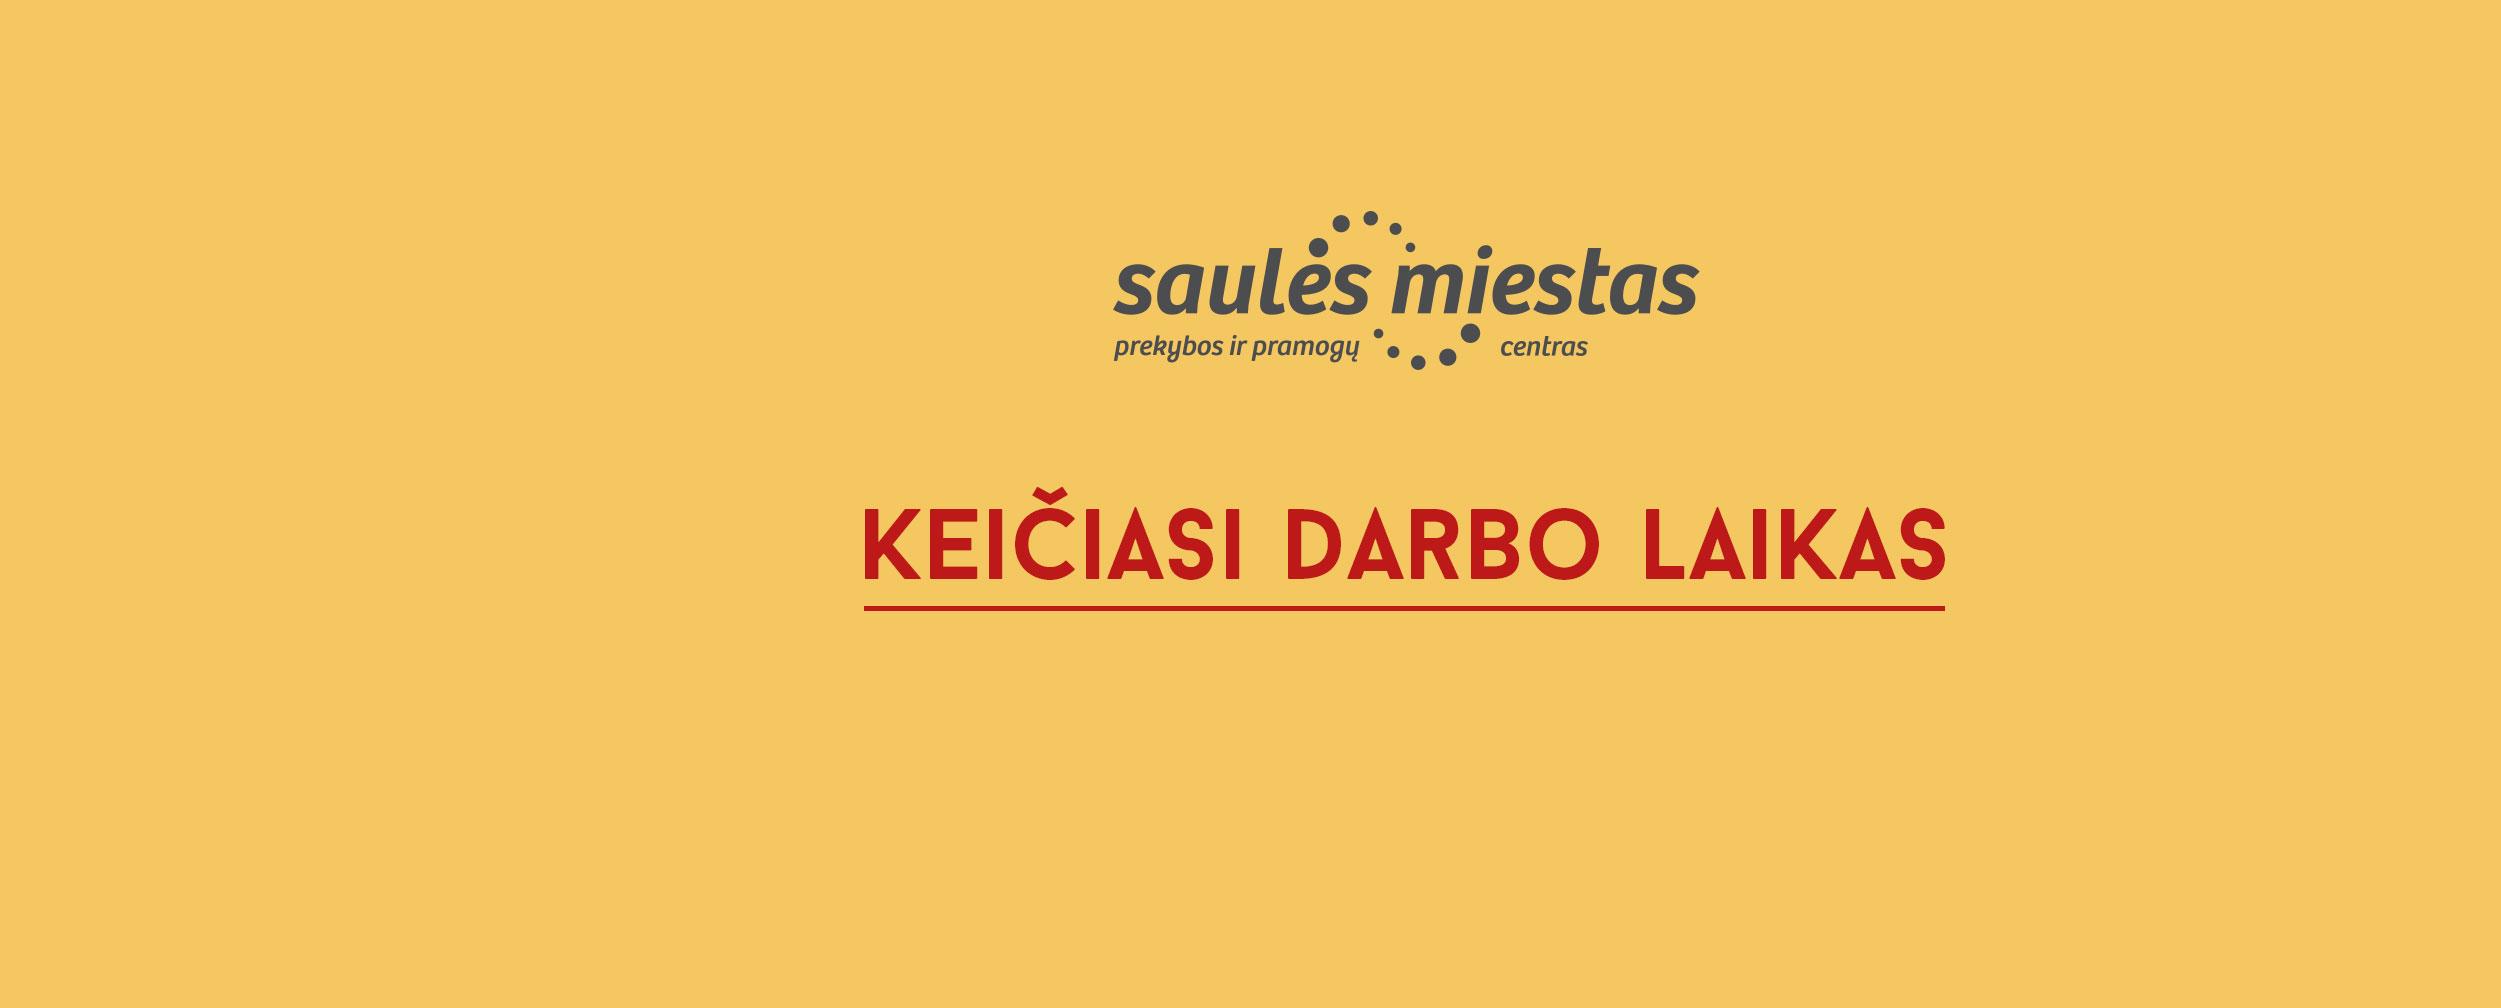 www.SM darbo laikas